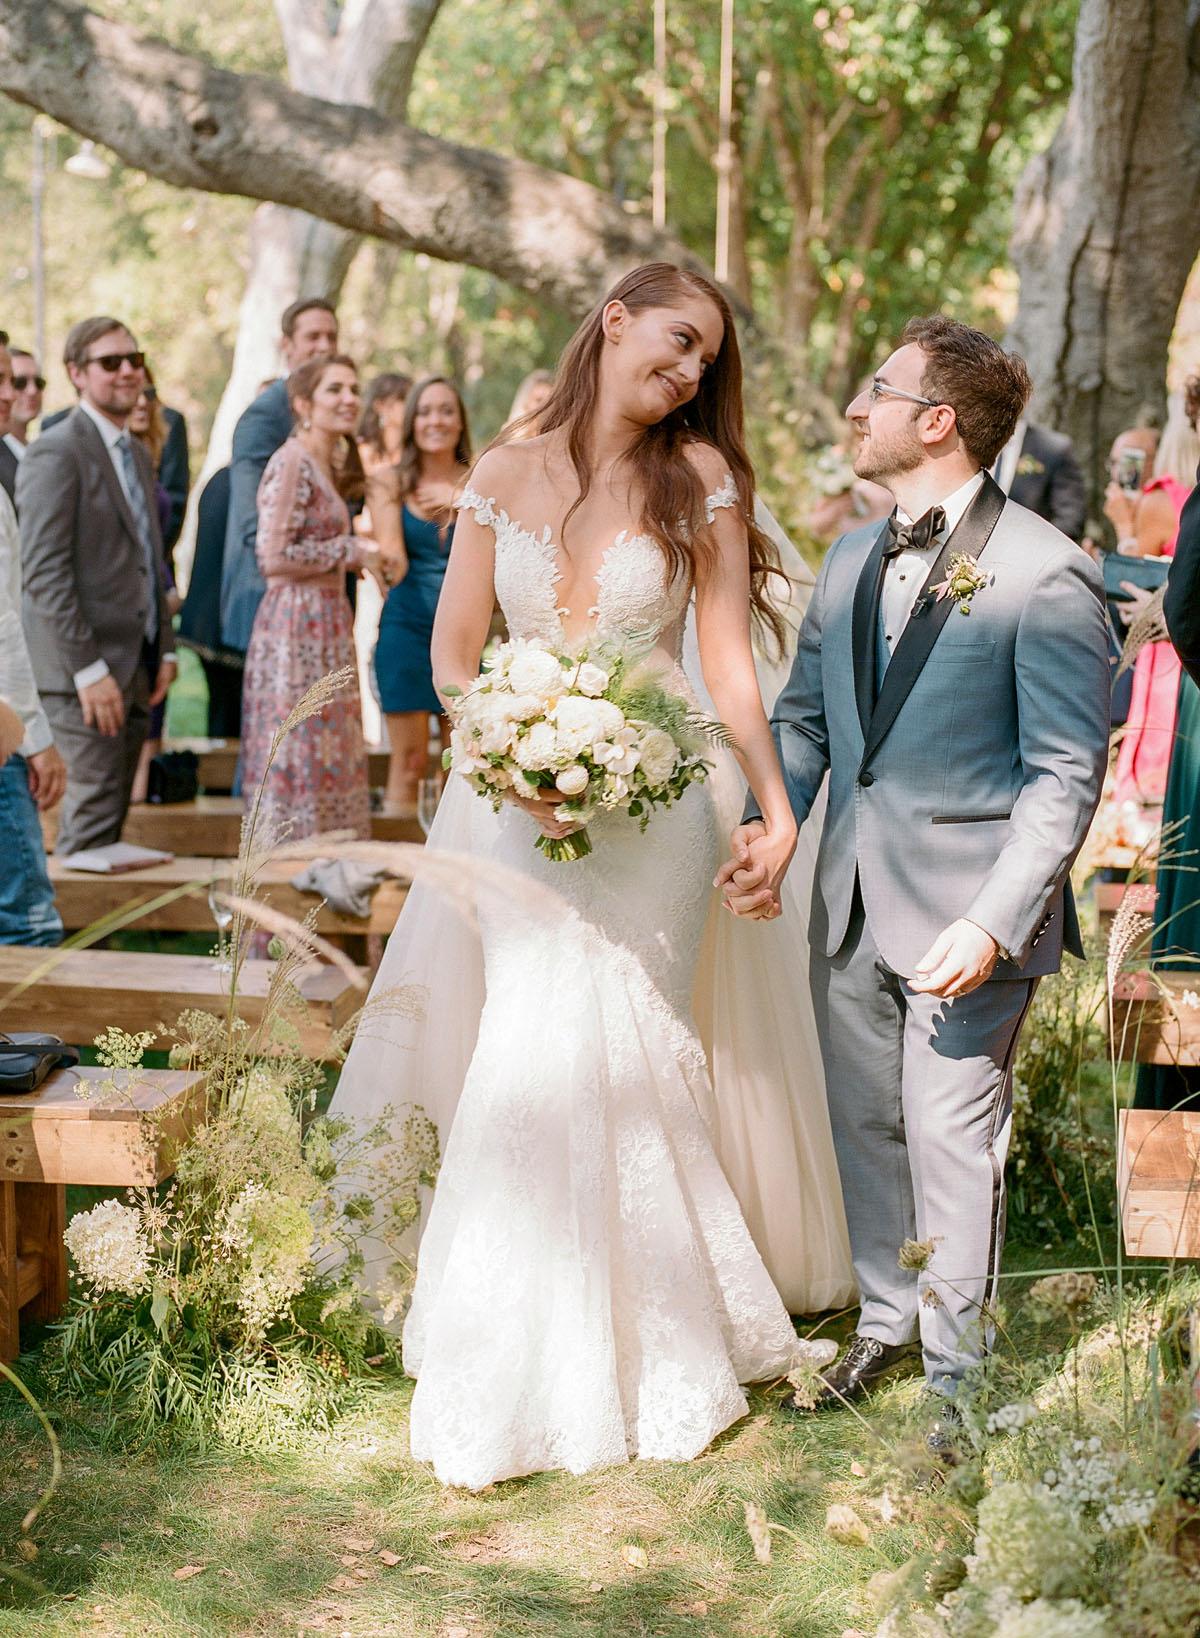 21-candid-wedding-christina-mcneill.jpg